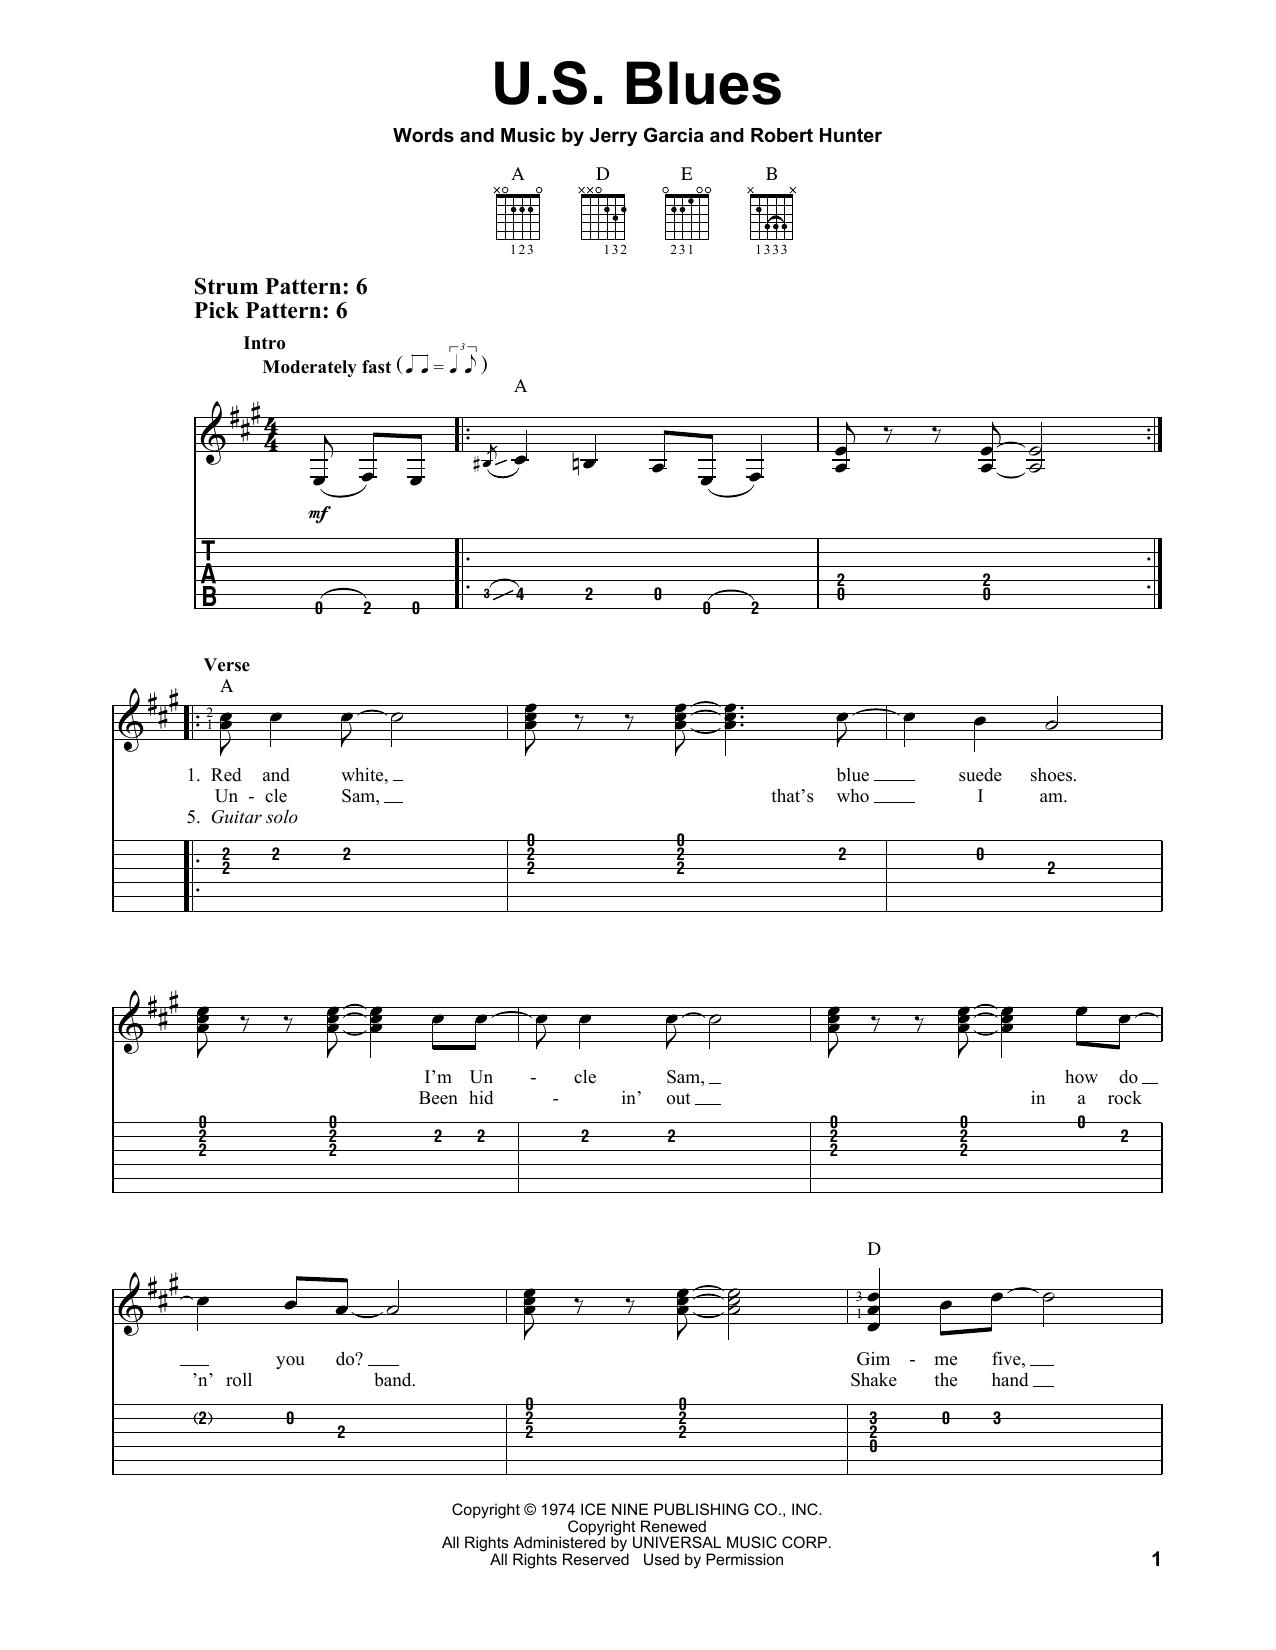 Grateful Dead 'U S  Blues' Sheet Music Notes, Chords   Download Printable  Easy Guitar Tab - SKU: 156723